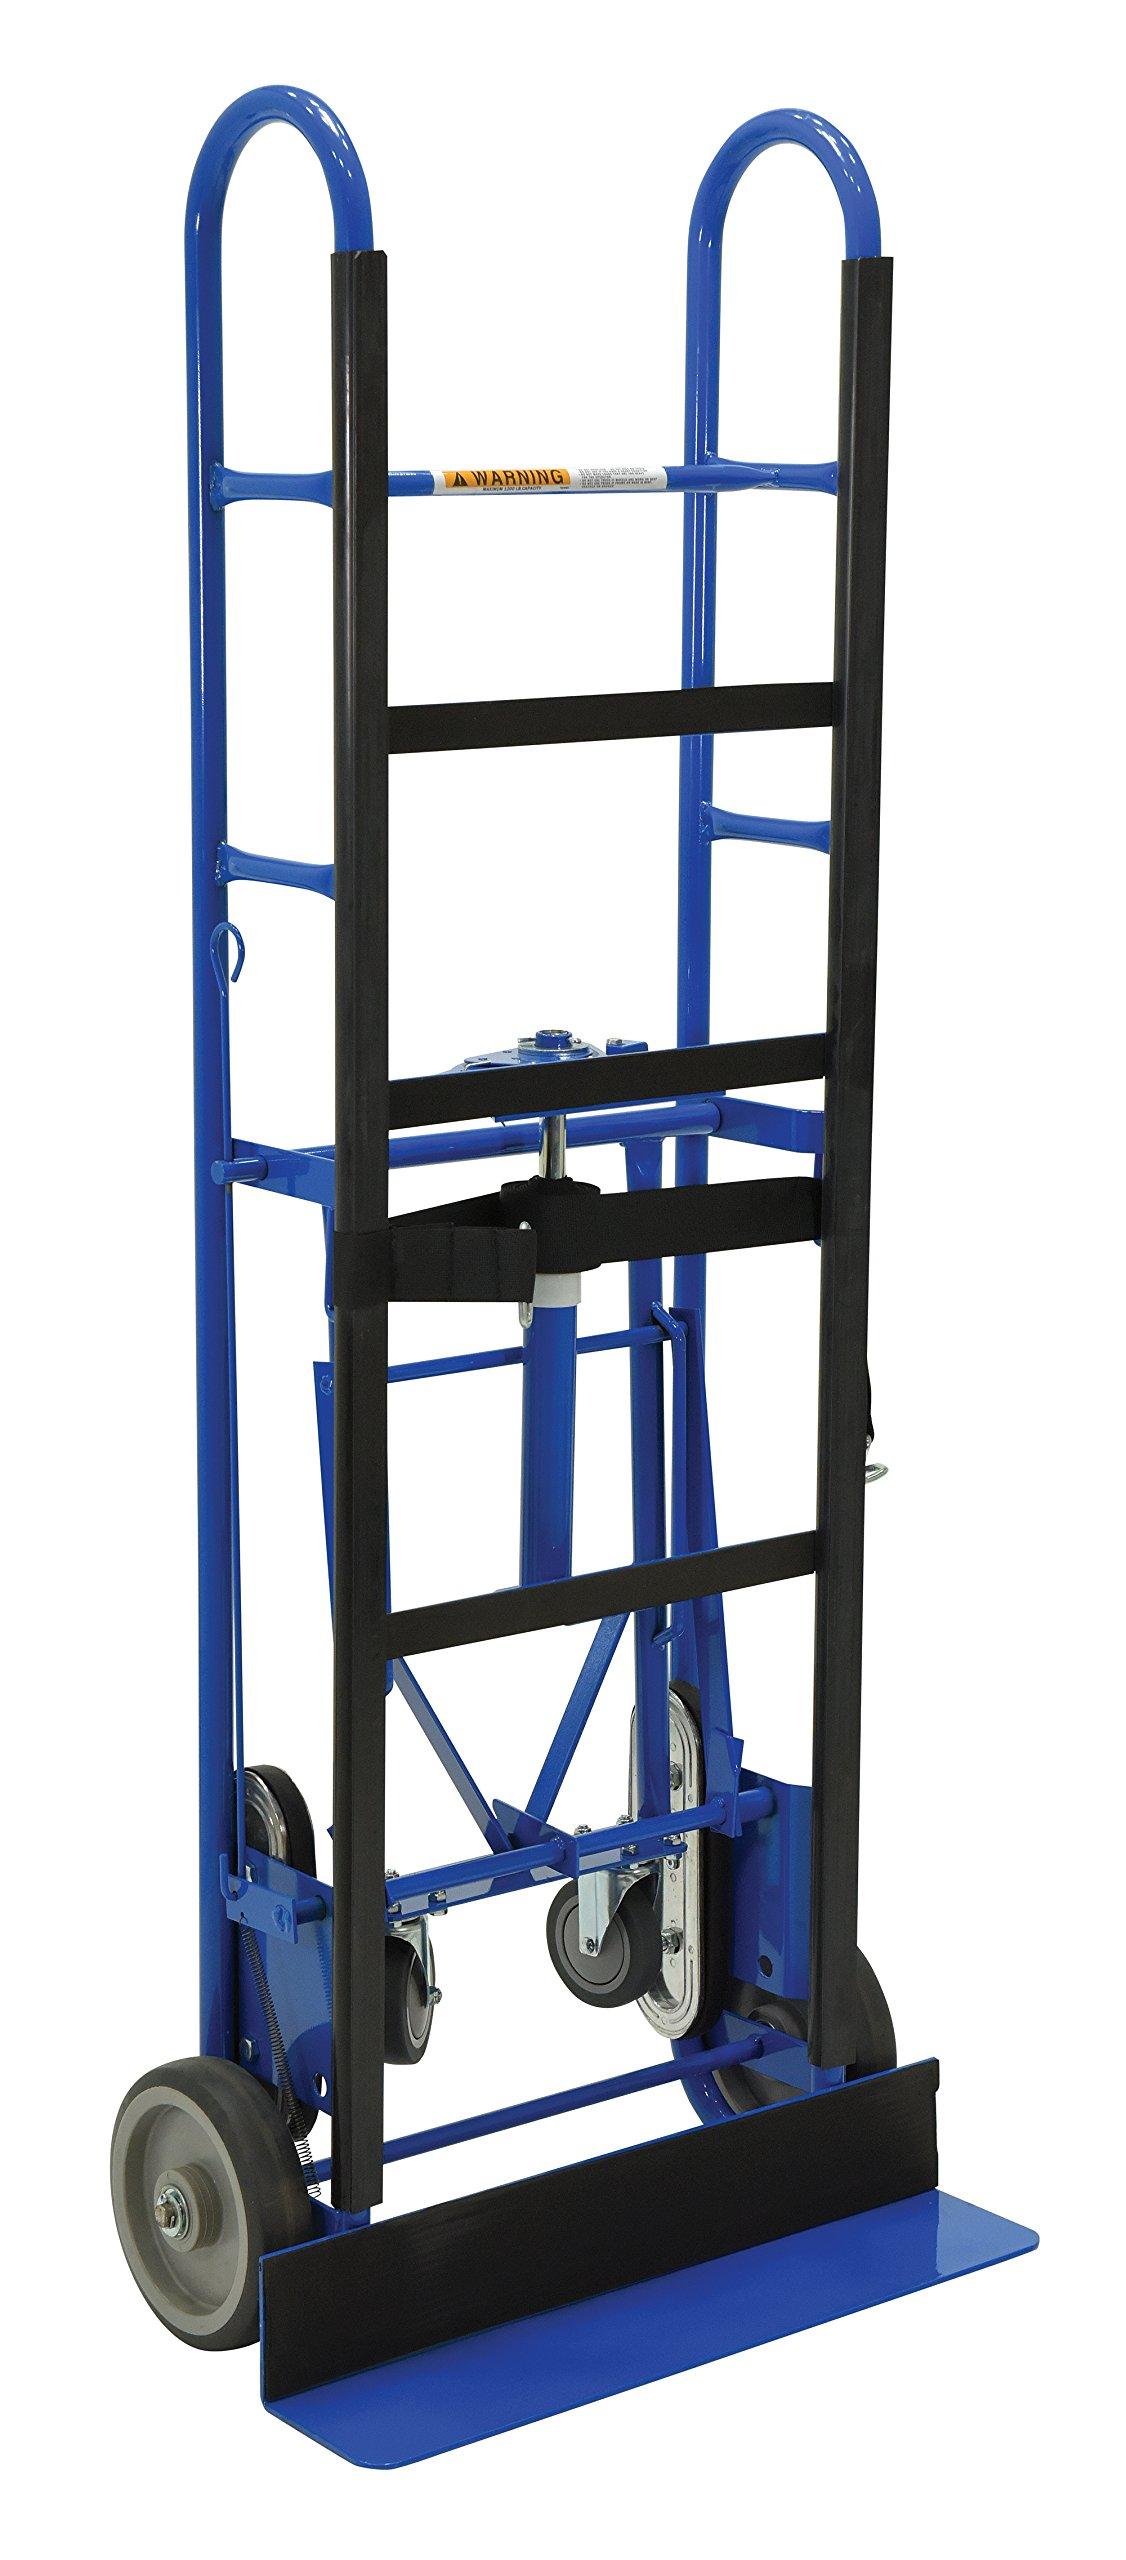 Vestil APPL-1200-60 Vending Machine/Appliance Cart, Ratchet 1200 lb. lb. Capacity, 15'' Length, 24'' Width, 60'' Height